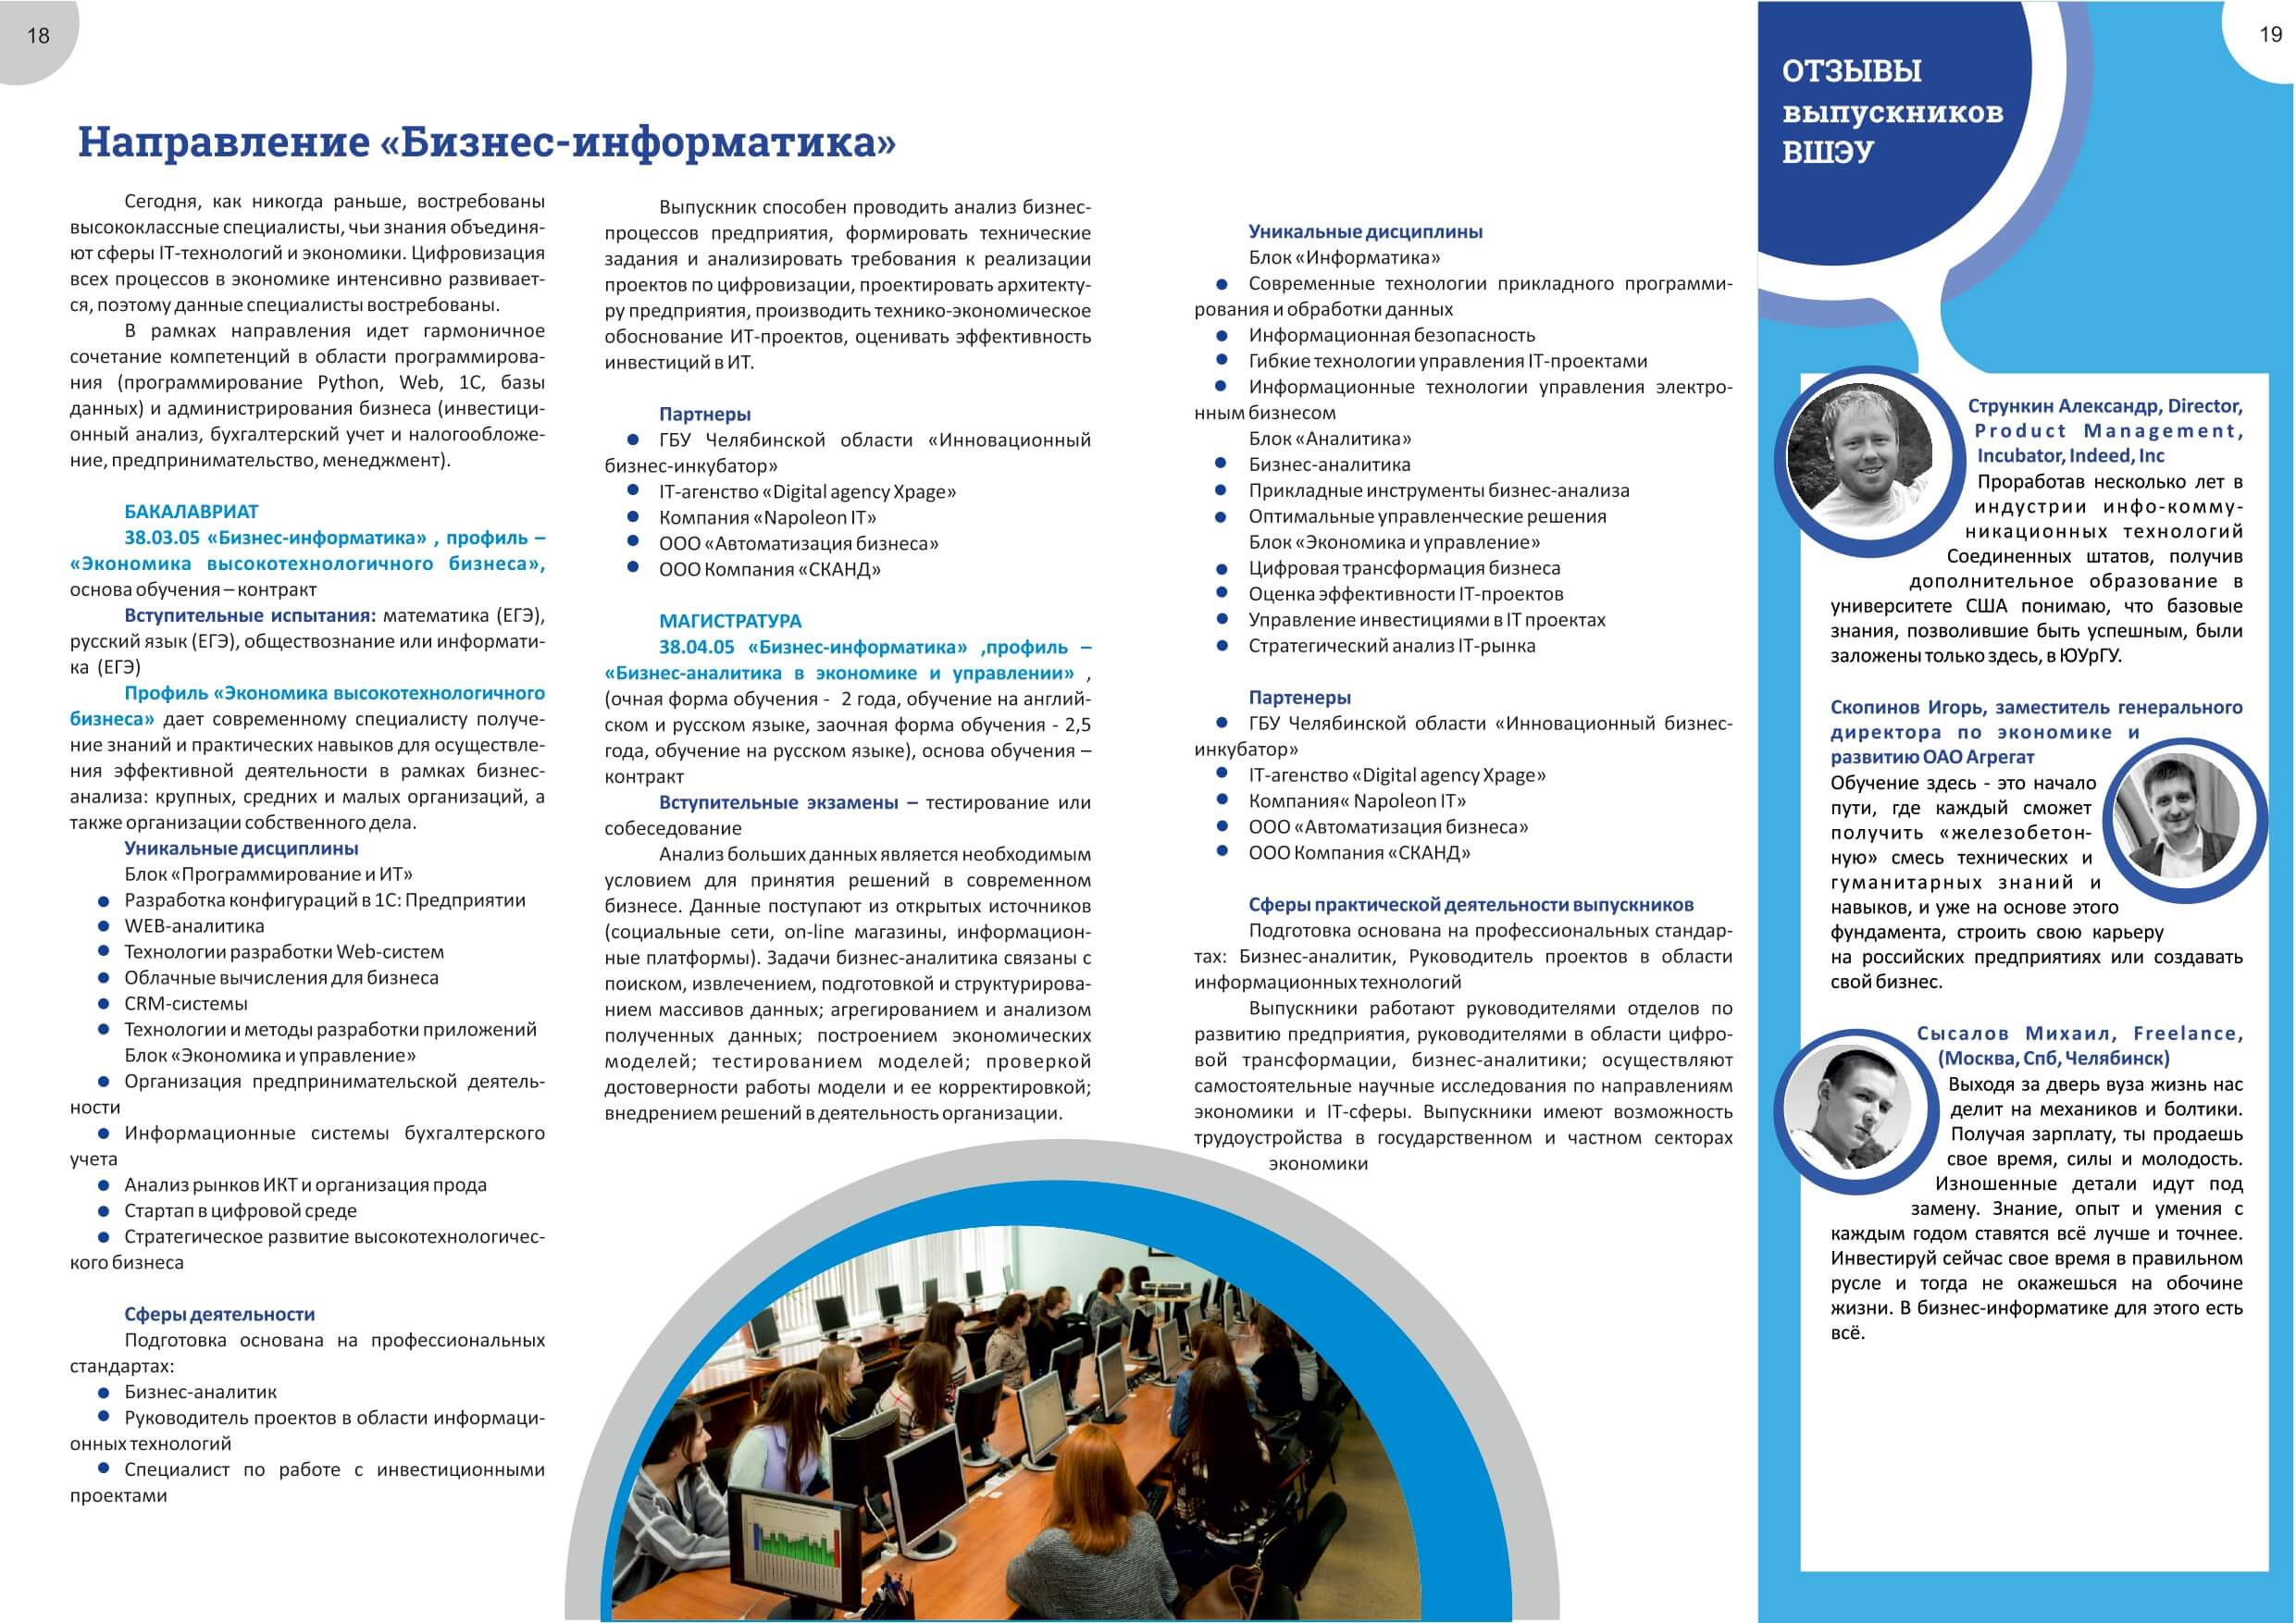 ВШЭУ Прием абитуриентов 2021_pages-to-jpg-0010